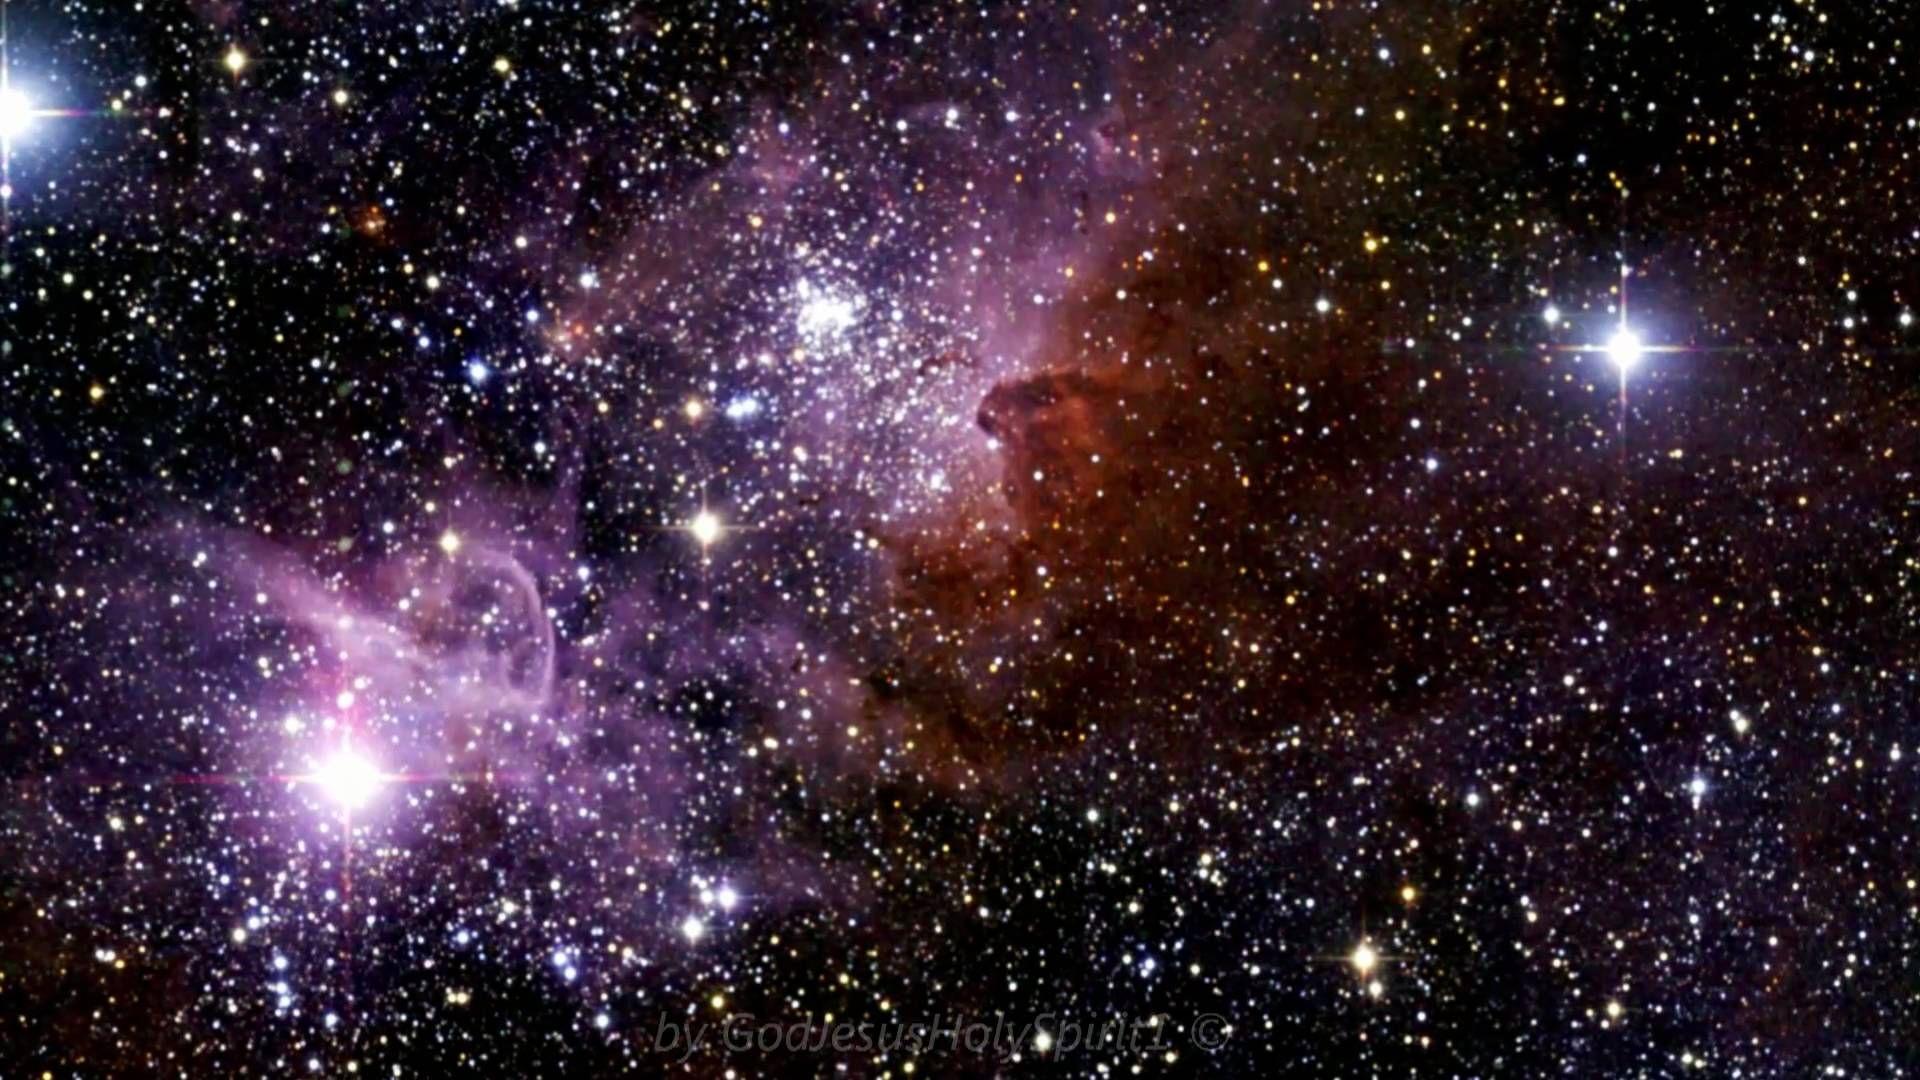 StarGaze Universal Beauty 1080p HD Галактики